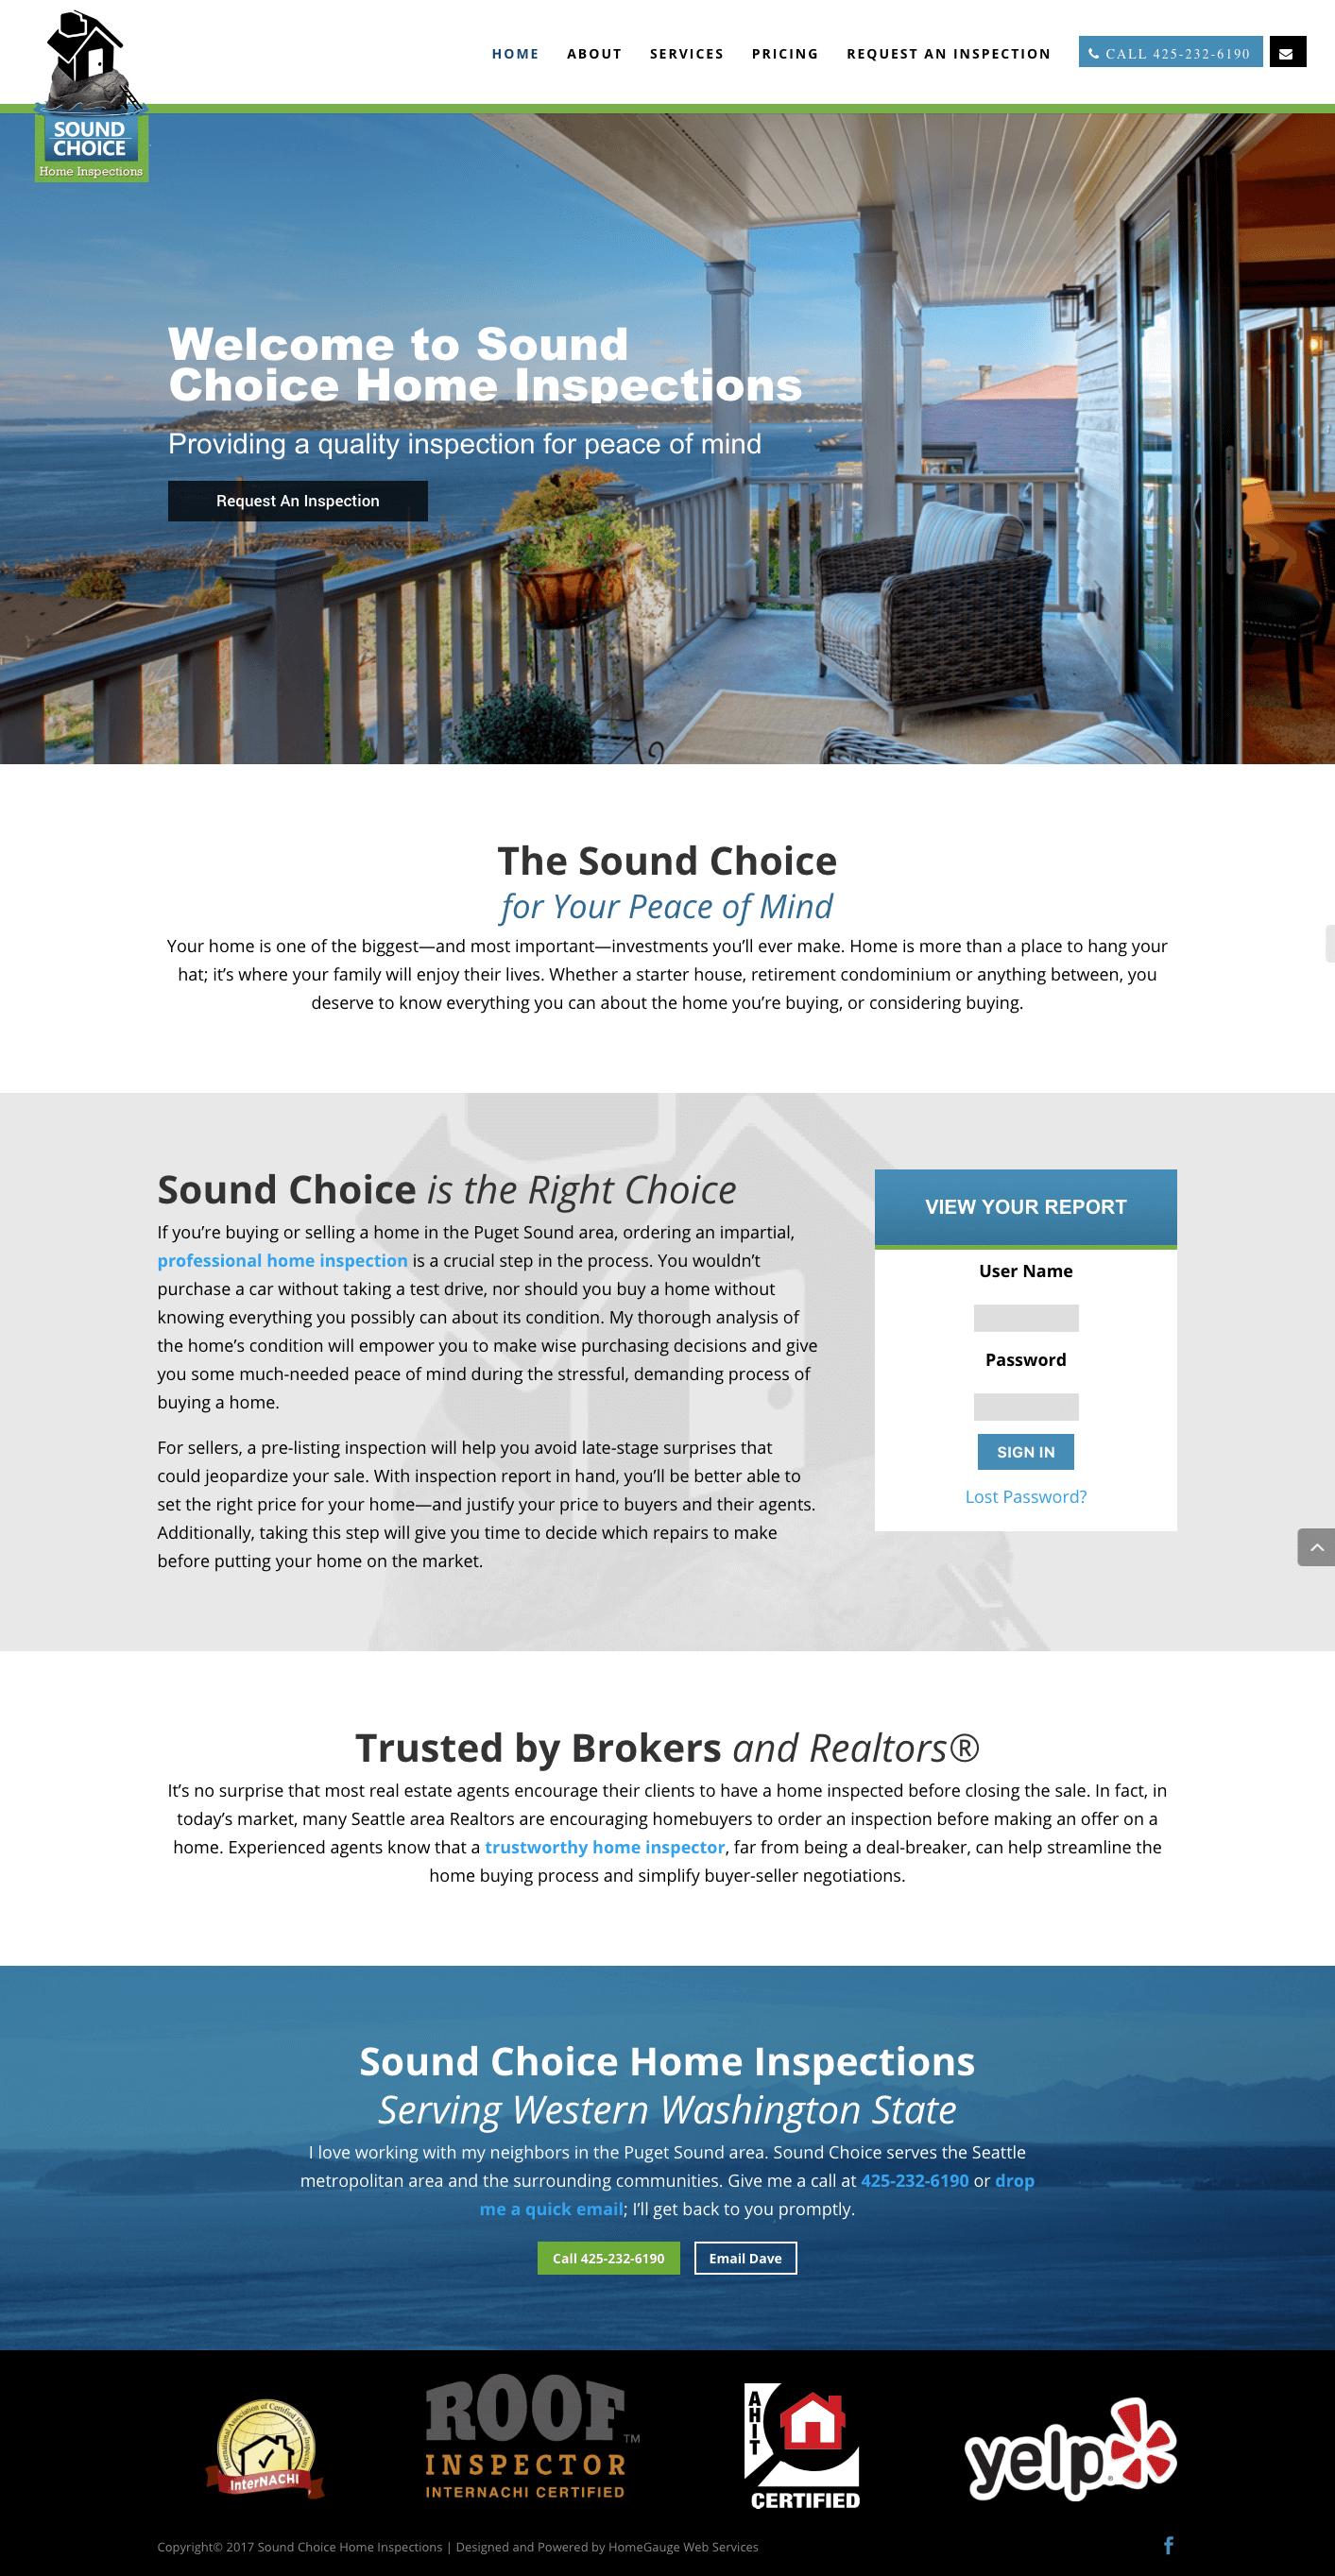 Sound Choice Home Inspections Seattle Washington Puget Sound Divi Wordpress Greenville Website Designer Website Design Design Subscription Box Design